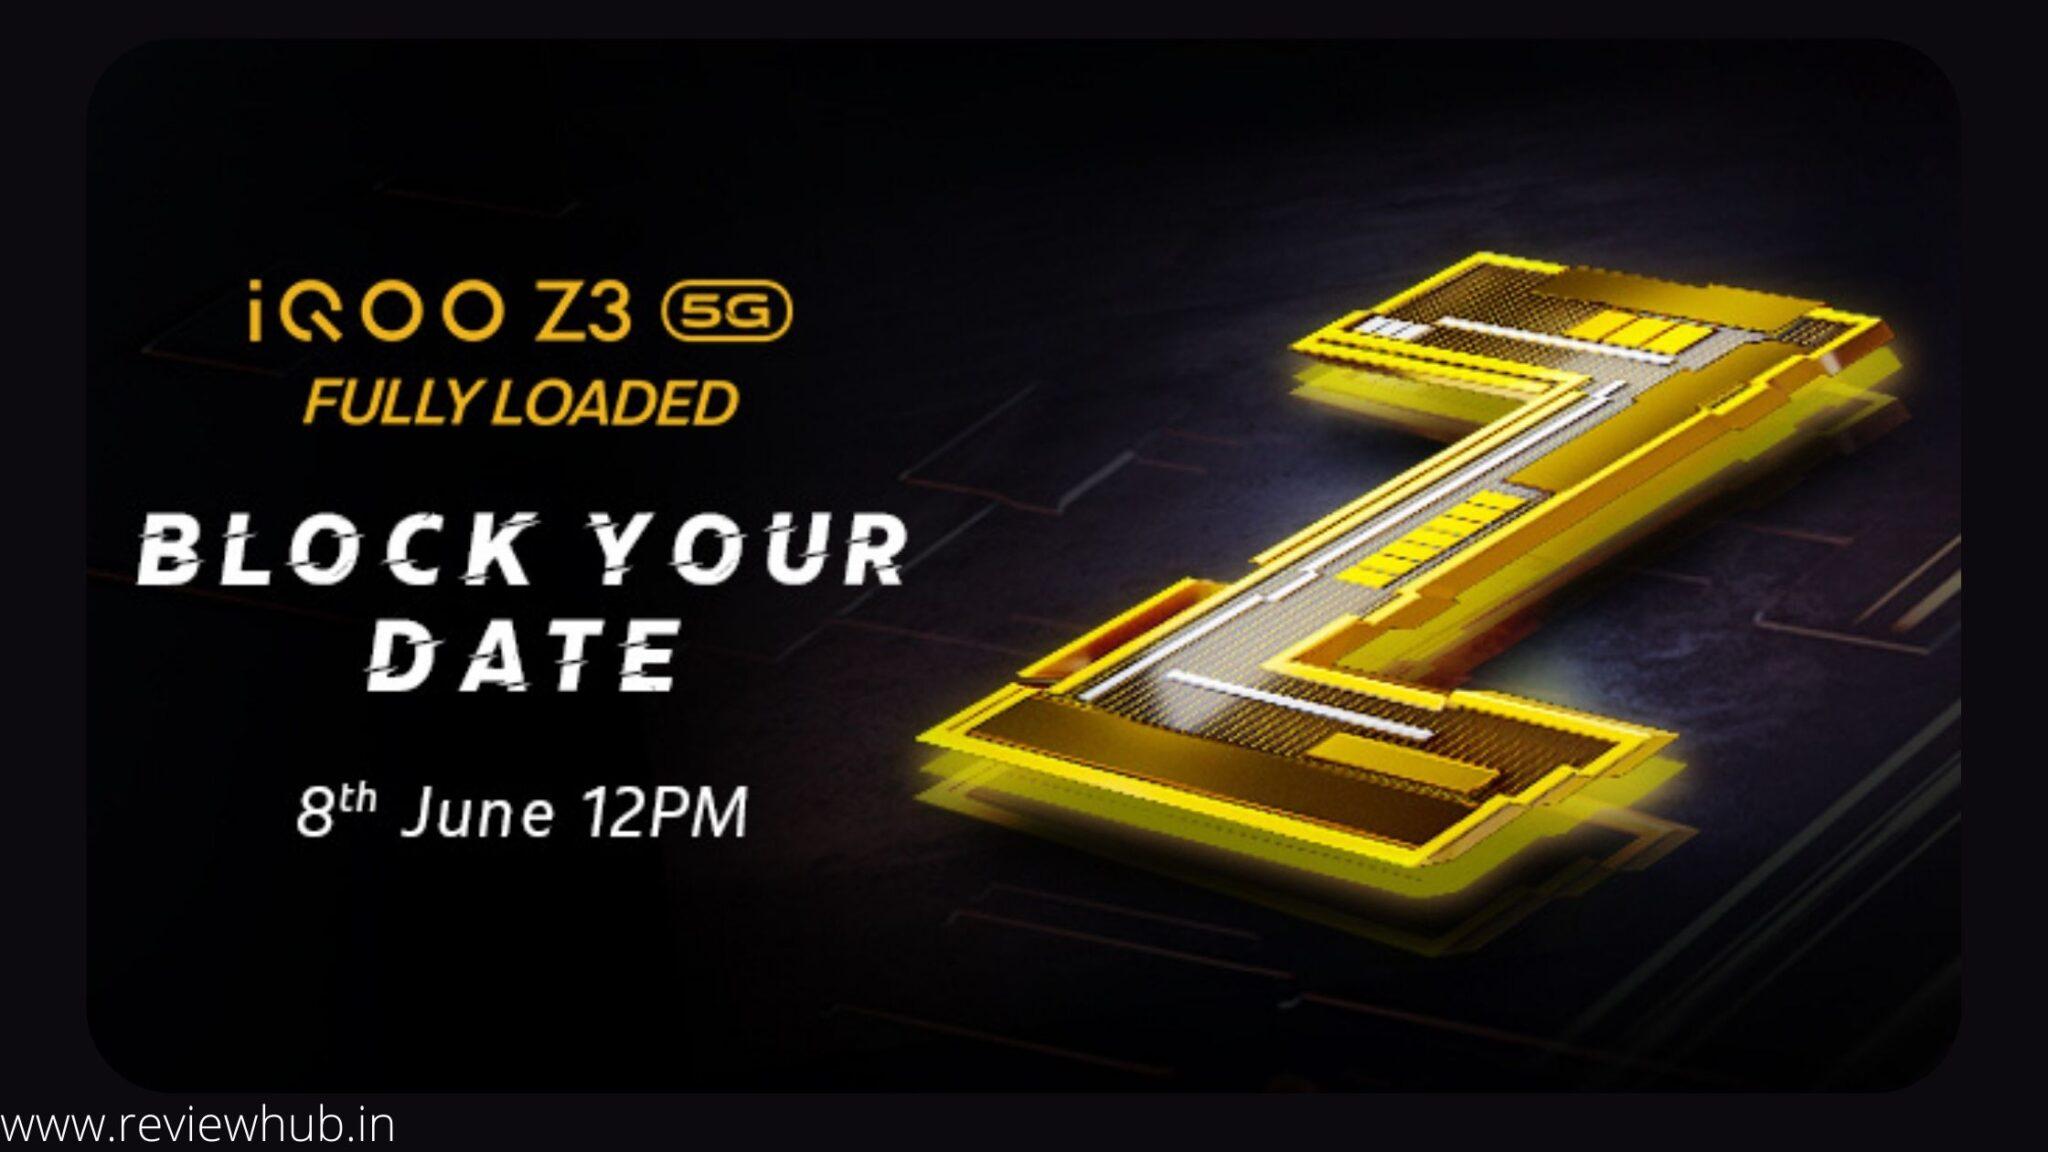 iQOO Z3 5G launch date